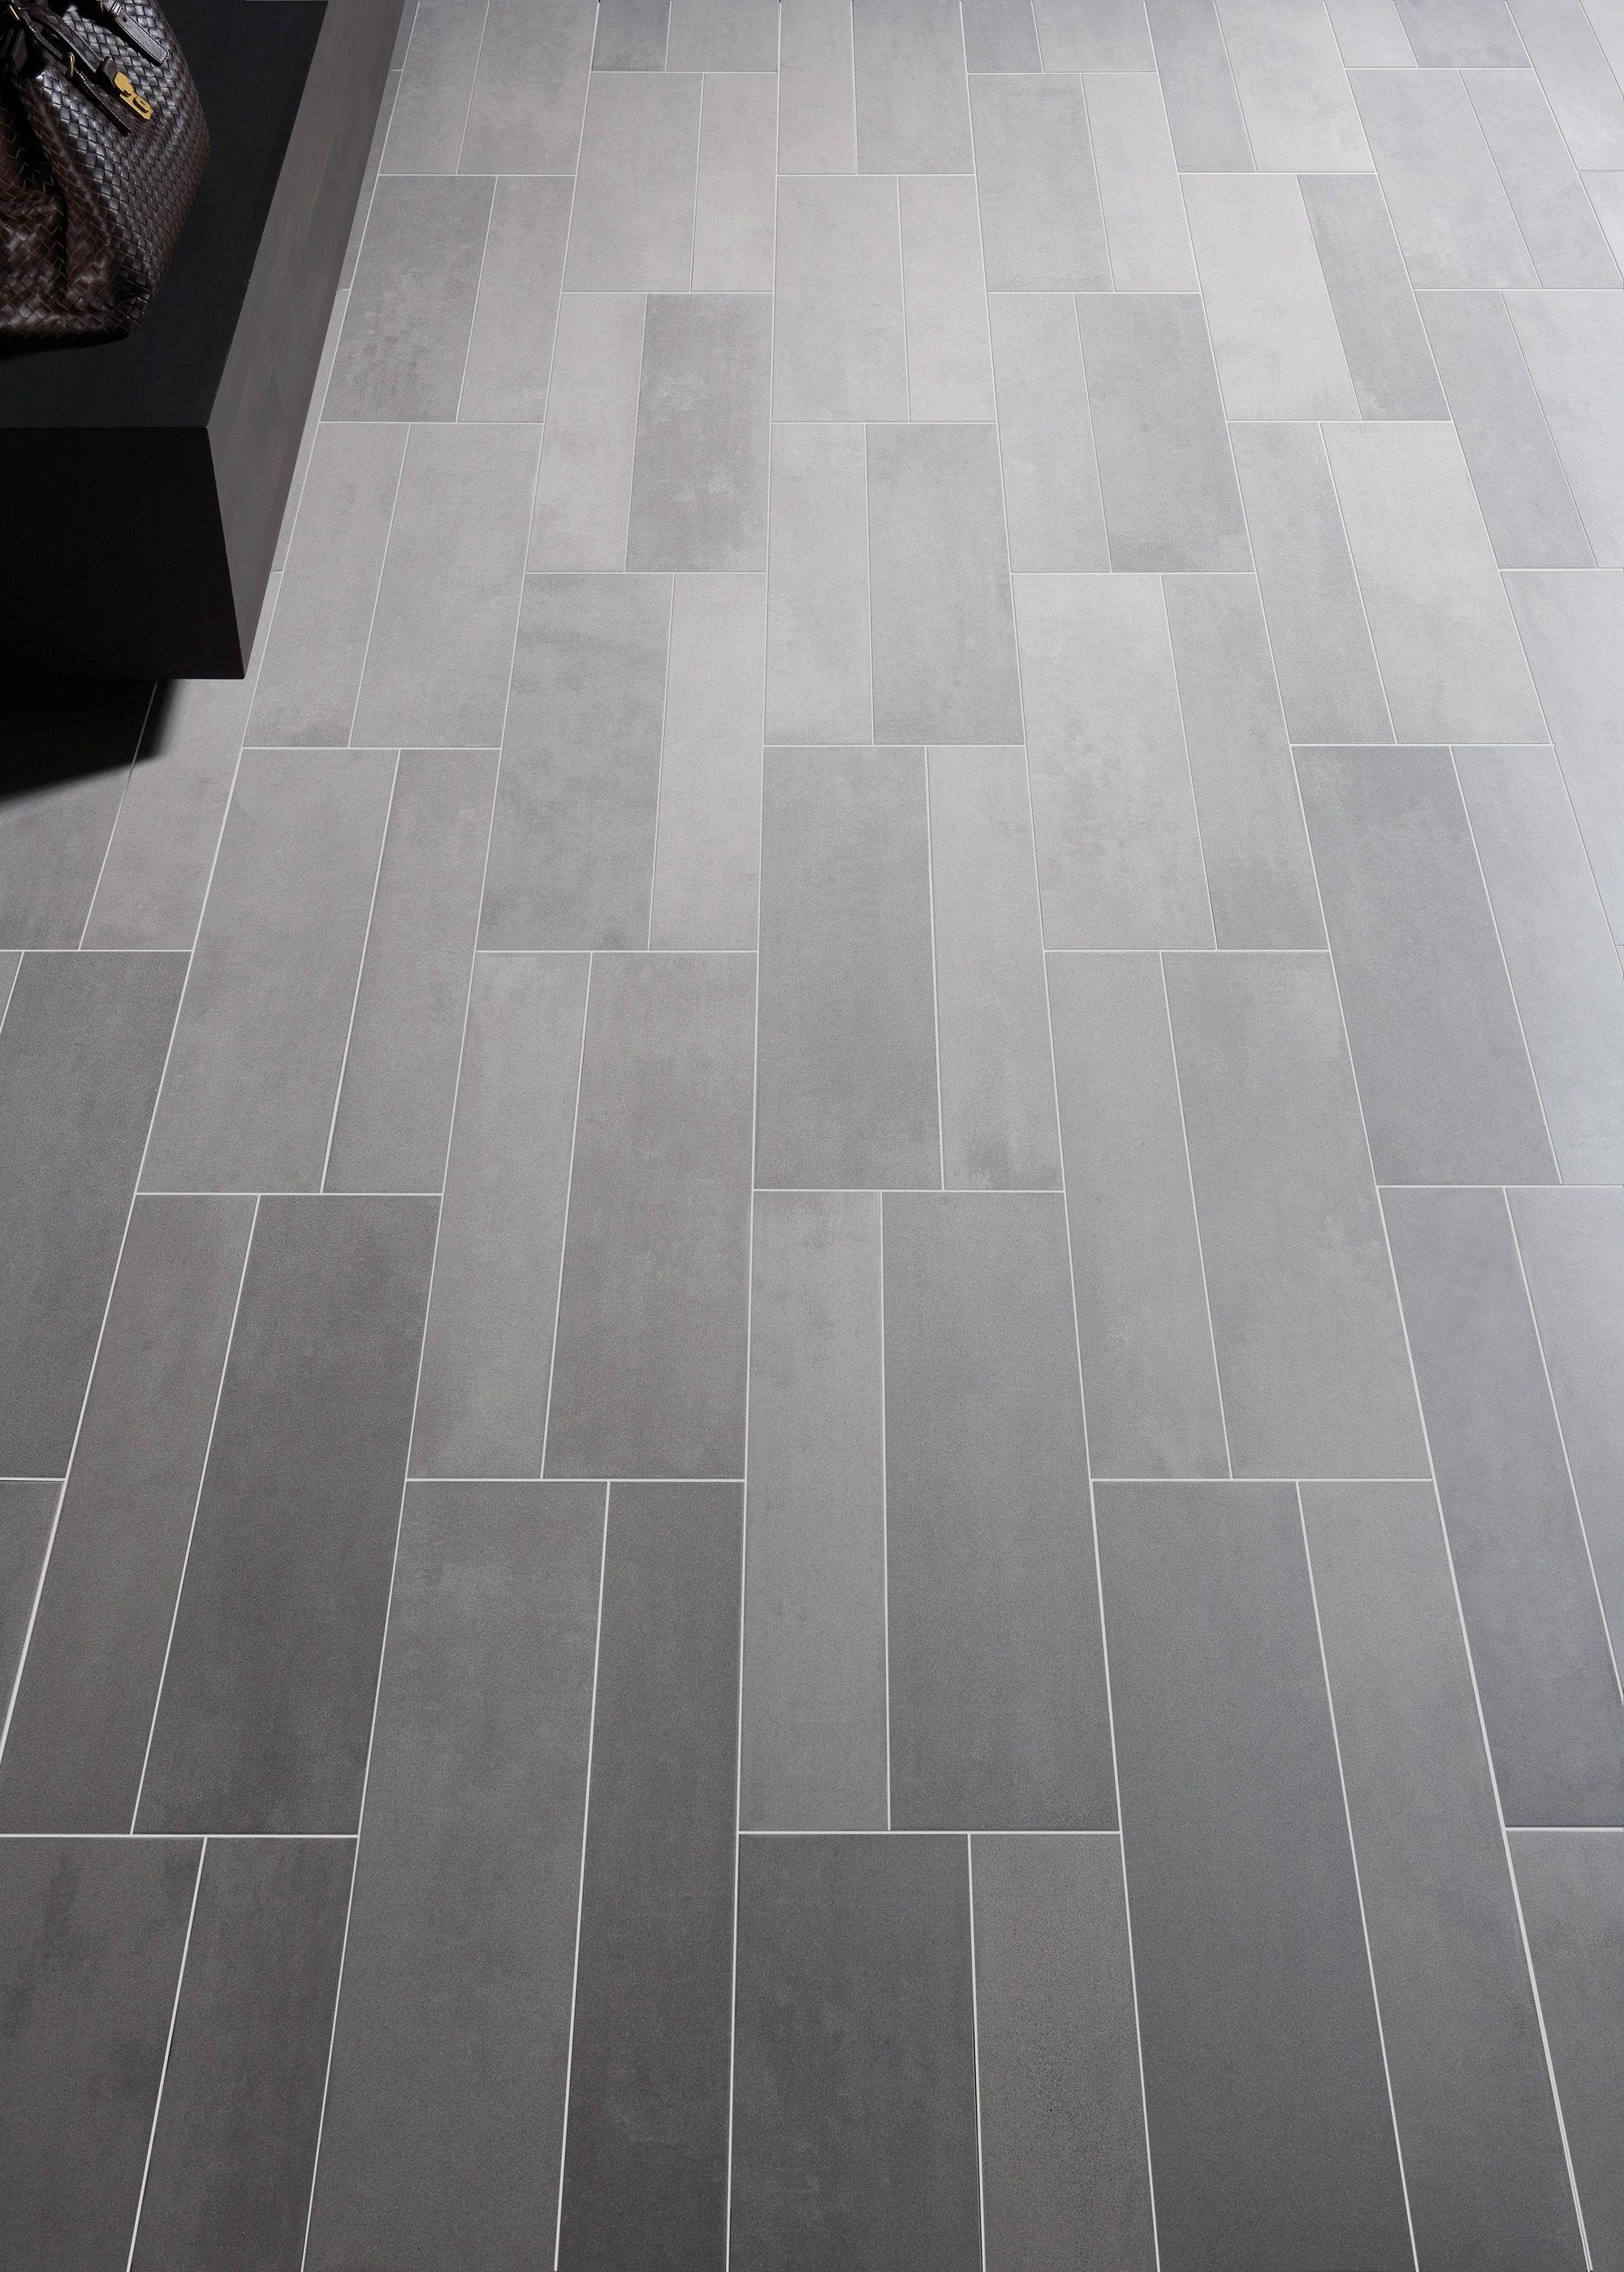 Grey ceramic tiles mosa terra tones rubble tile minneapolis grey ceramic tiles mosa terra tones rubble tile minneapolis rubble tile dailygadgetfo Choice Image